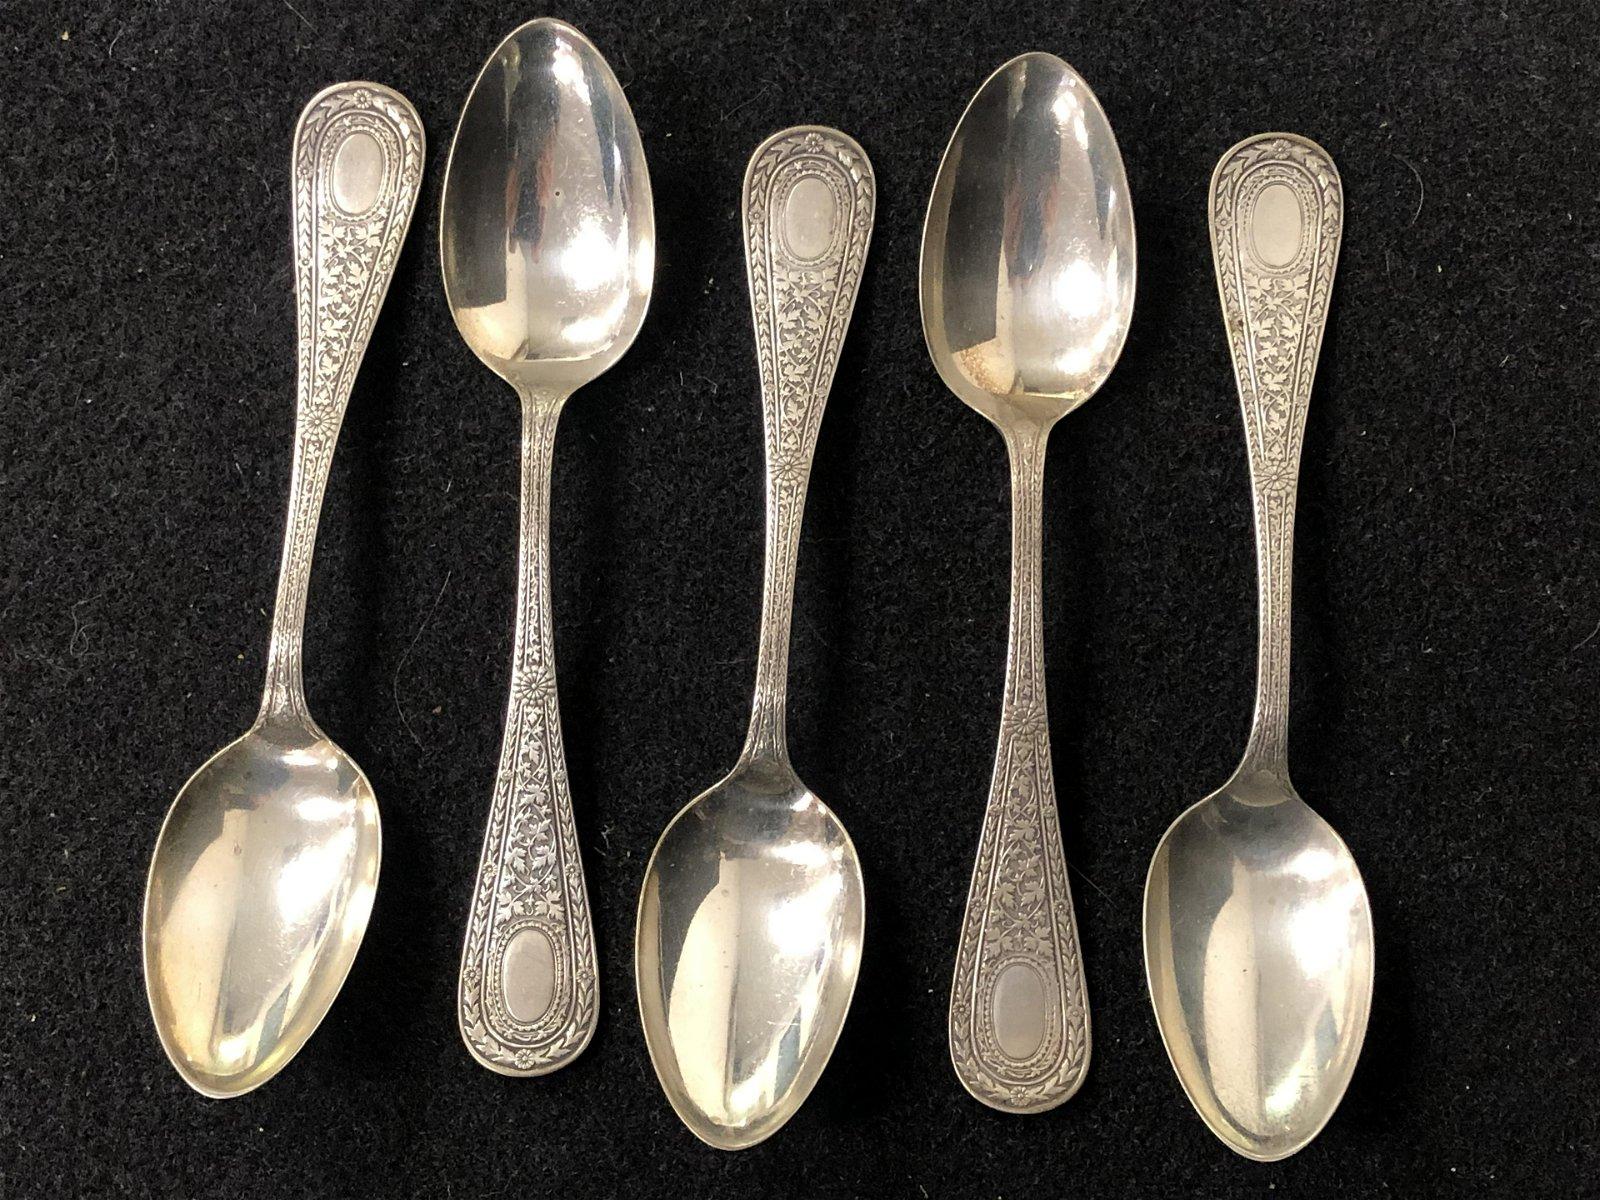 5 Antique Sterling Gorham Spoons - Gorham / Whiting,